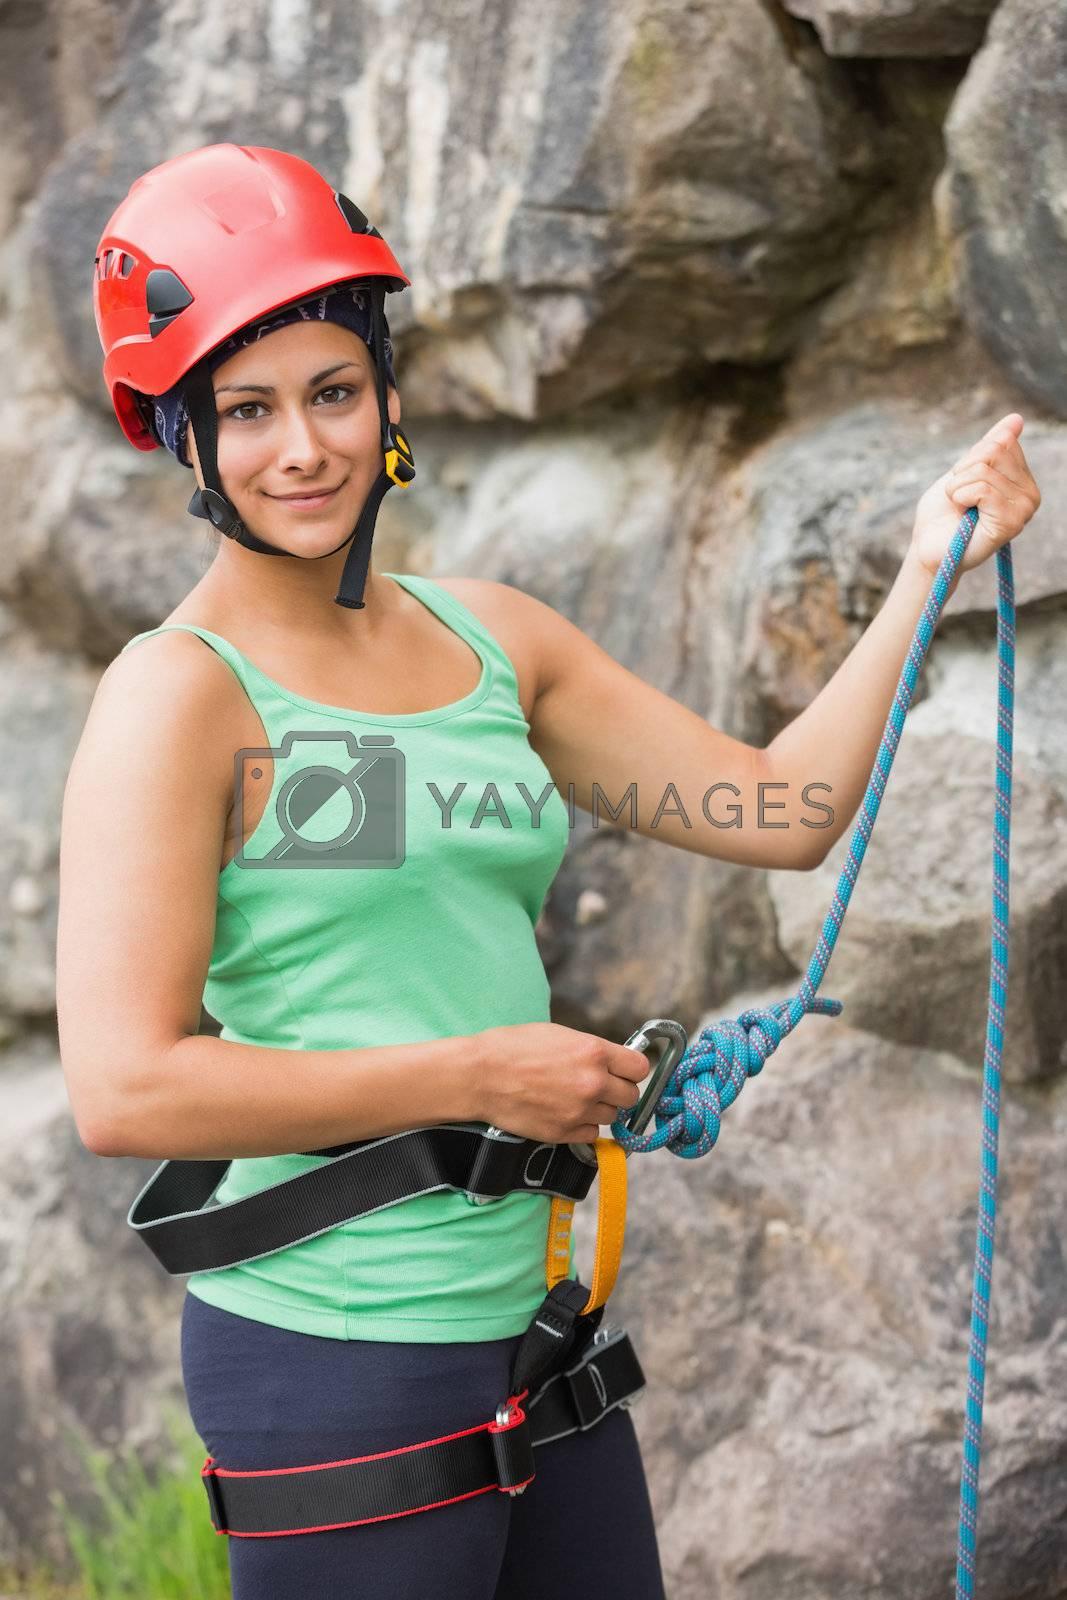 Pretty rock climber about to start her climb by Wavebreakmedia